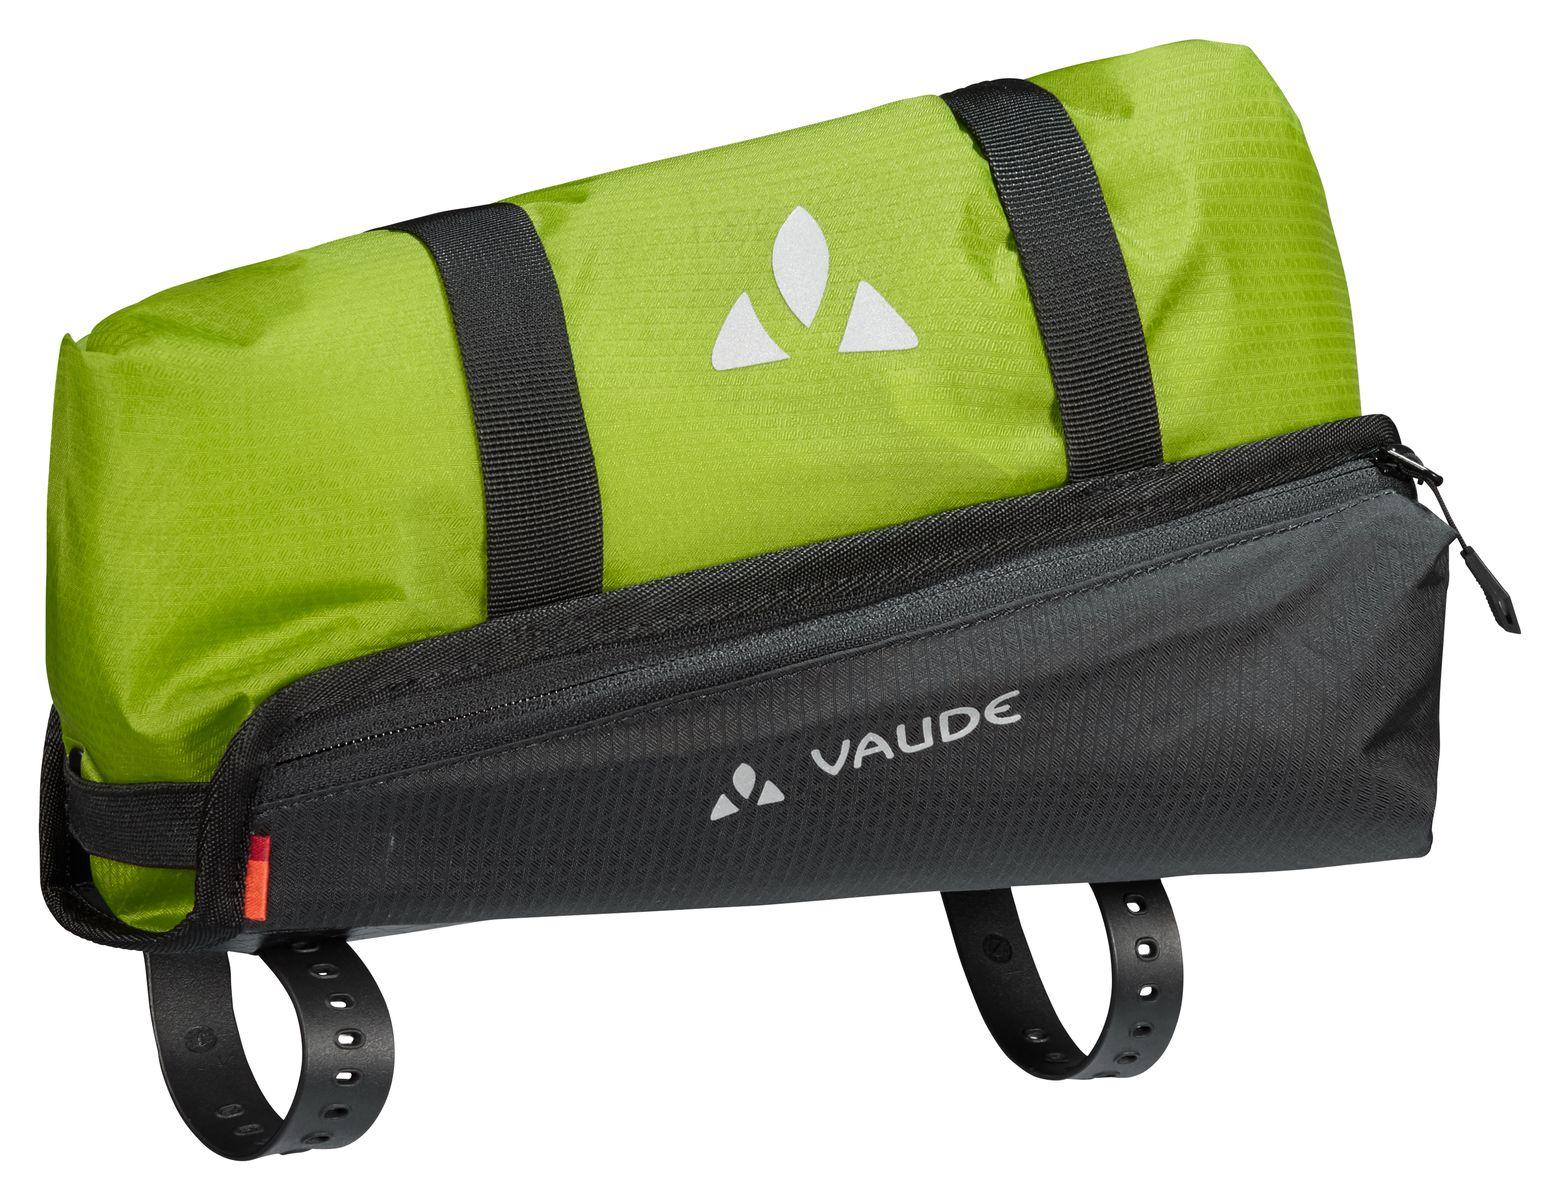 /Black Vaude Tube Bag Saddle Bag/